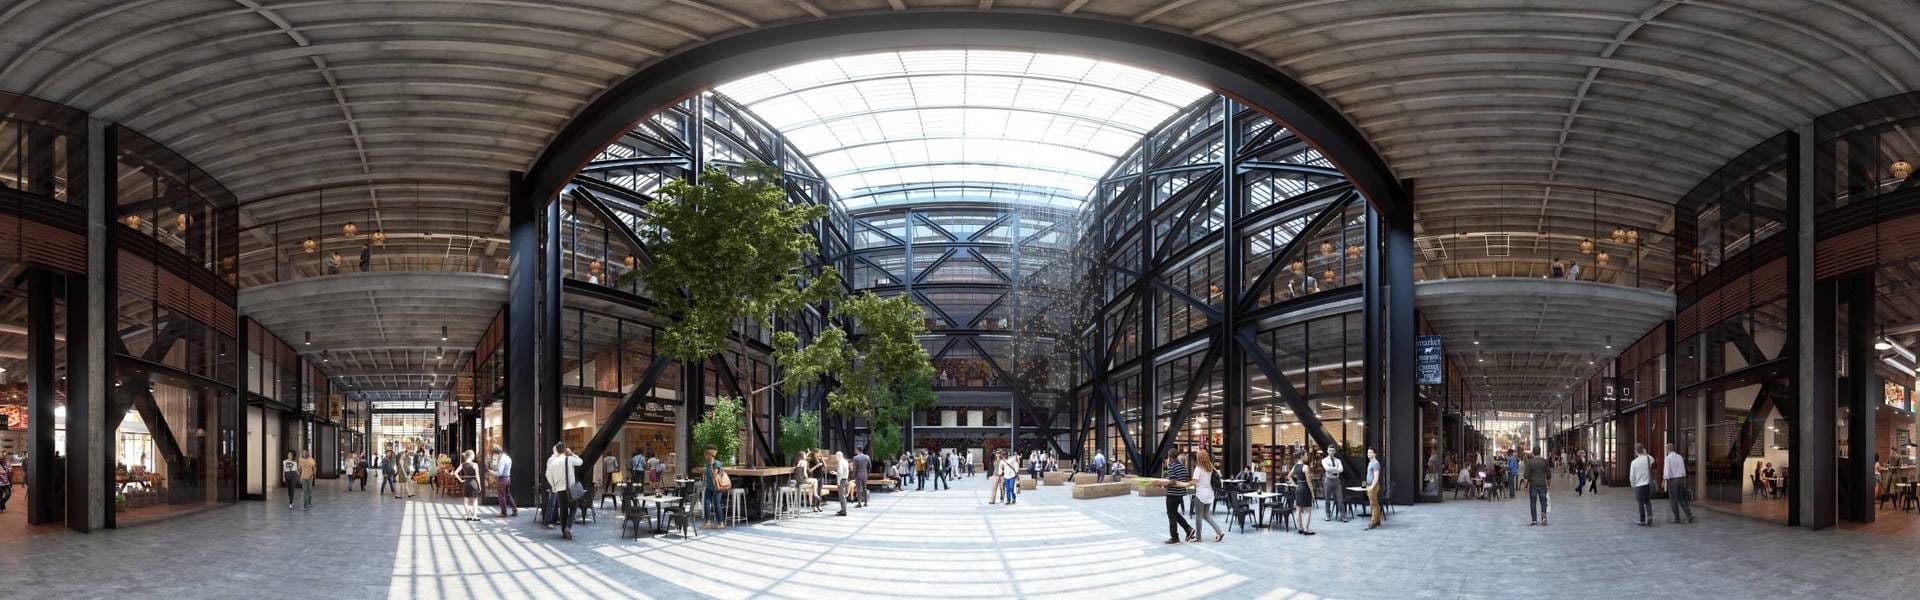 Steelblue atrium 360 architecture vray 3ds max